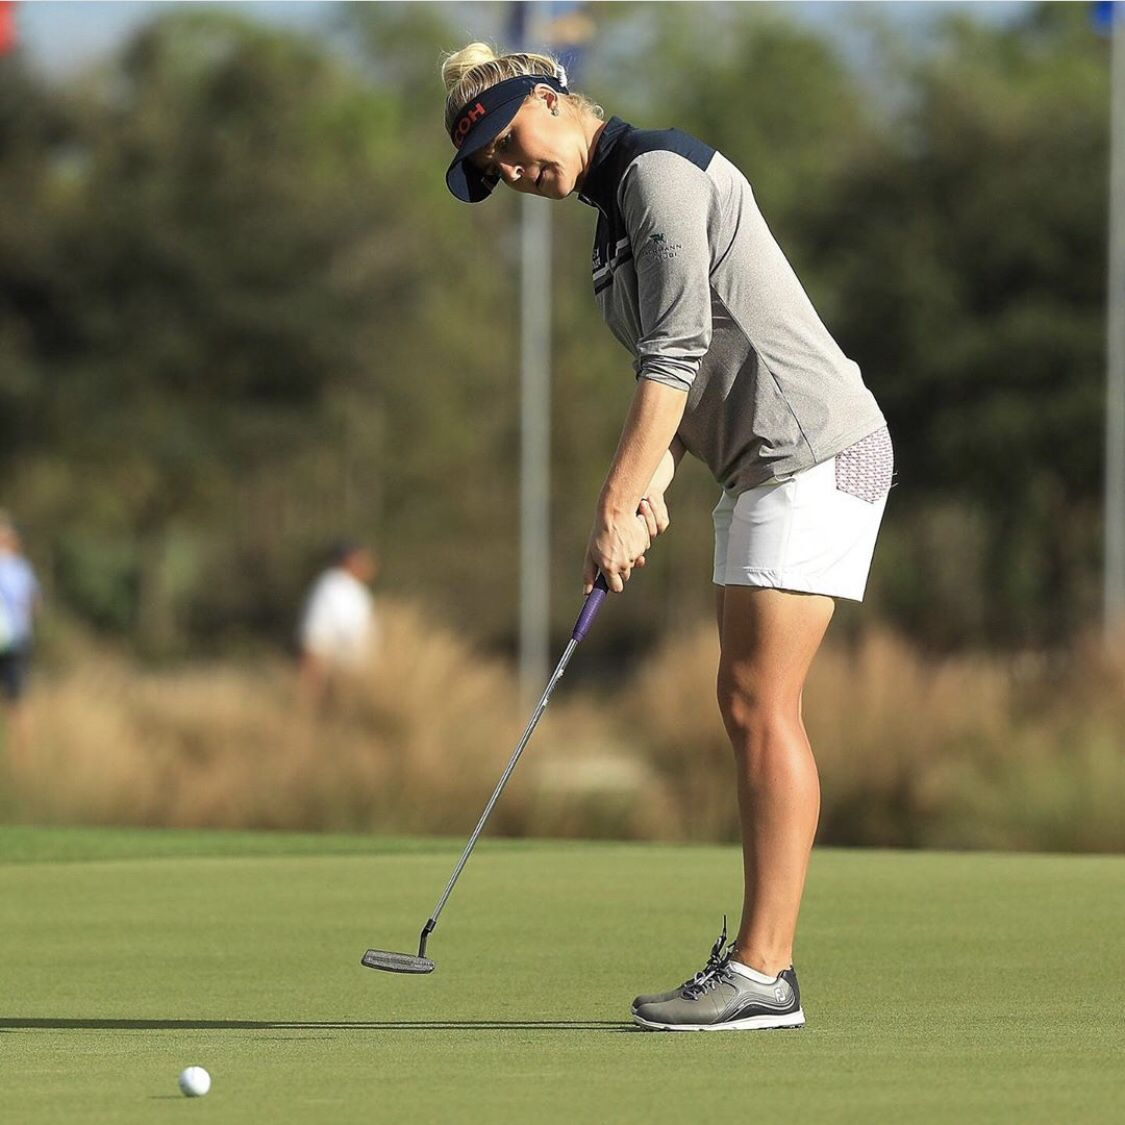 d6a633b51f0433 FootJoy golfkleding dames | Golfkleding dames - SS19 in 2019 - Golf ...